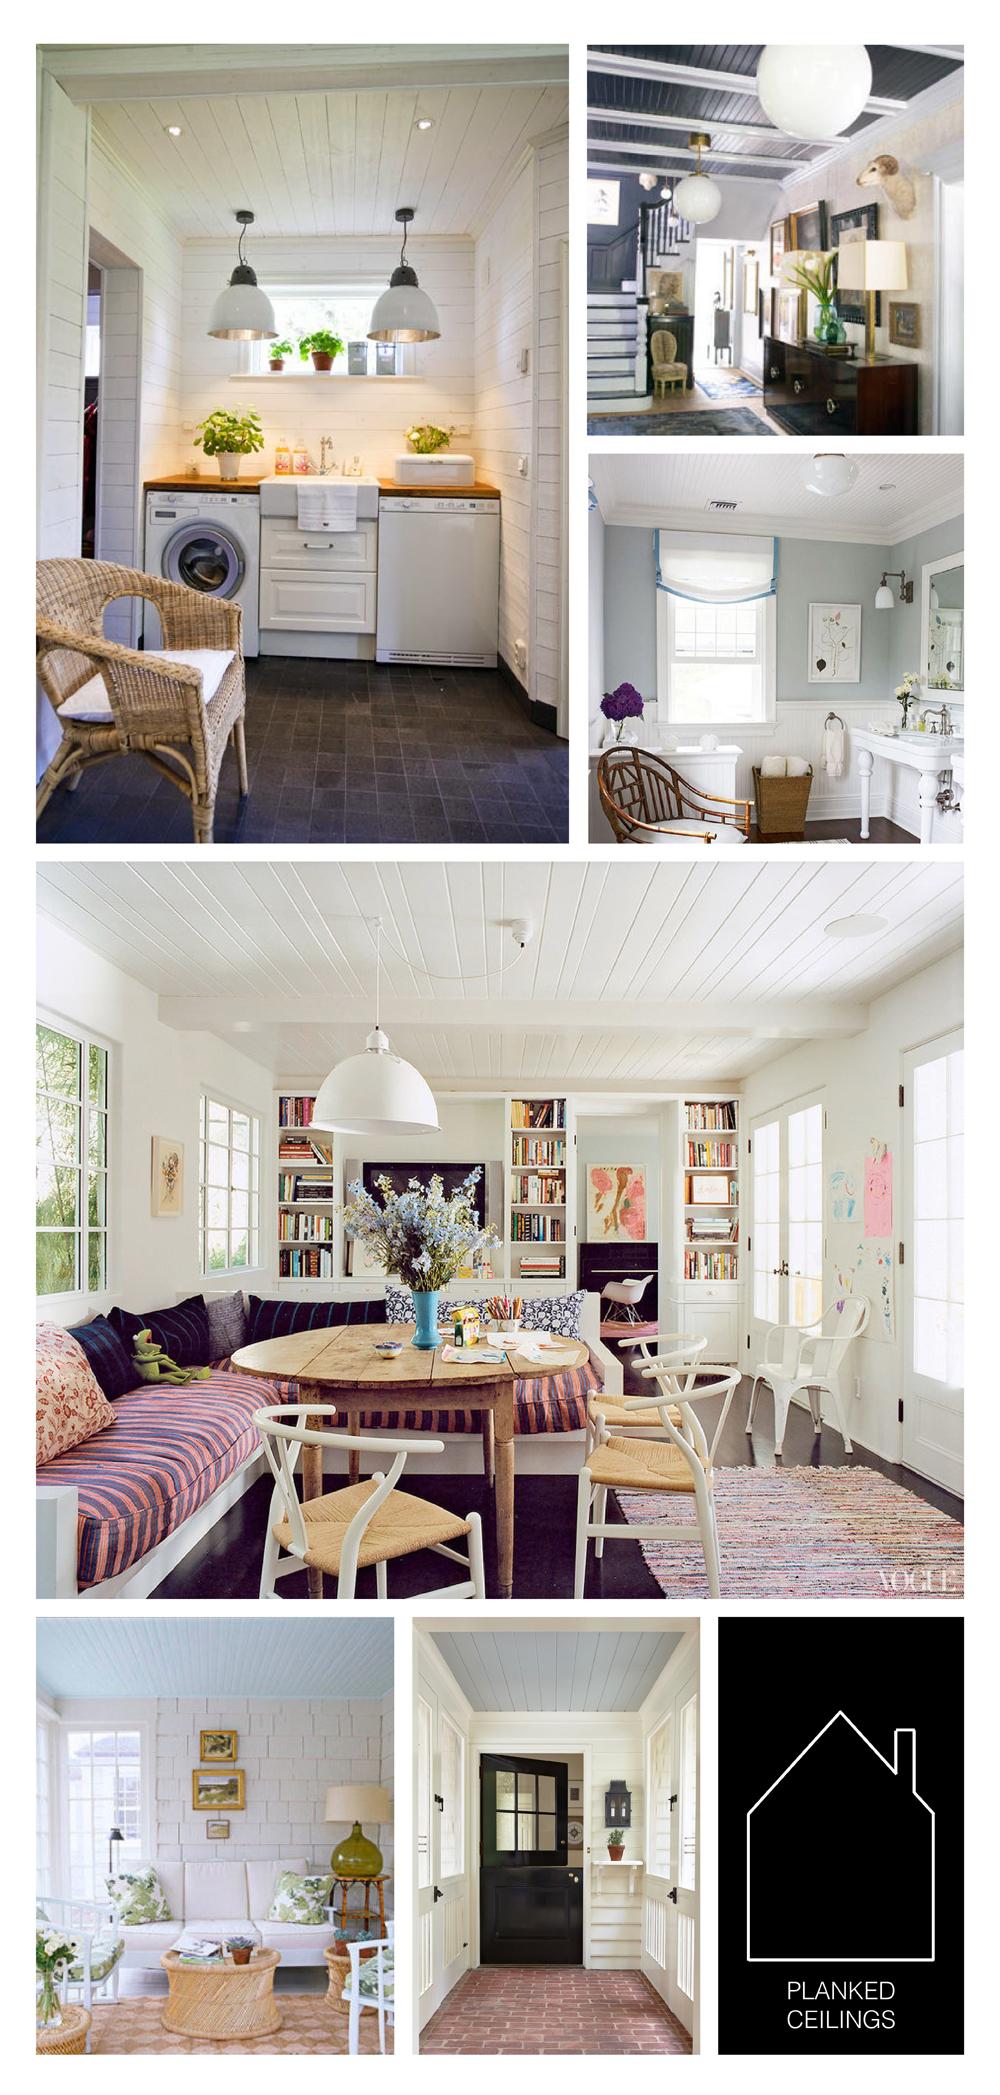 from top left  - via  Pellmell Creations - via  Elle Decor - home of Patricia Fischer via  HomeDit - home of Amanda Peet via  Vogue - via  House Beautiful  - source unknown